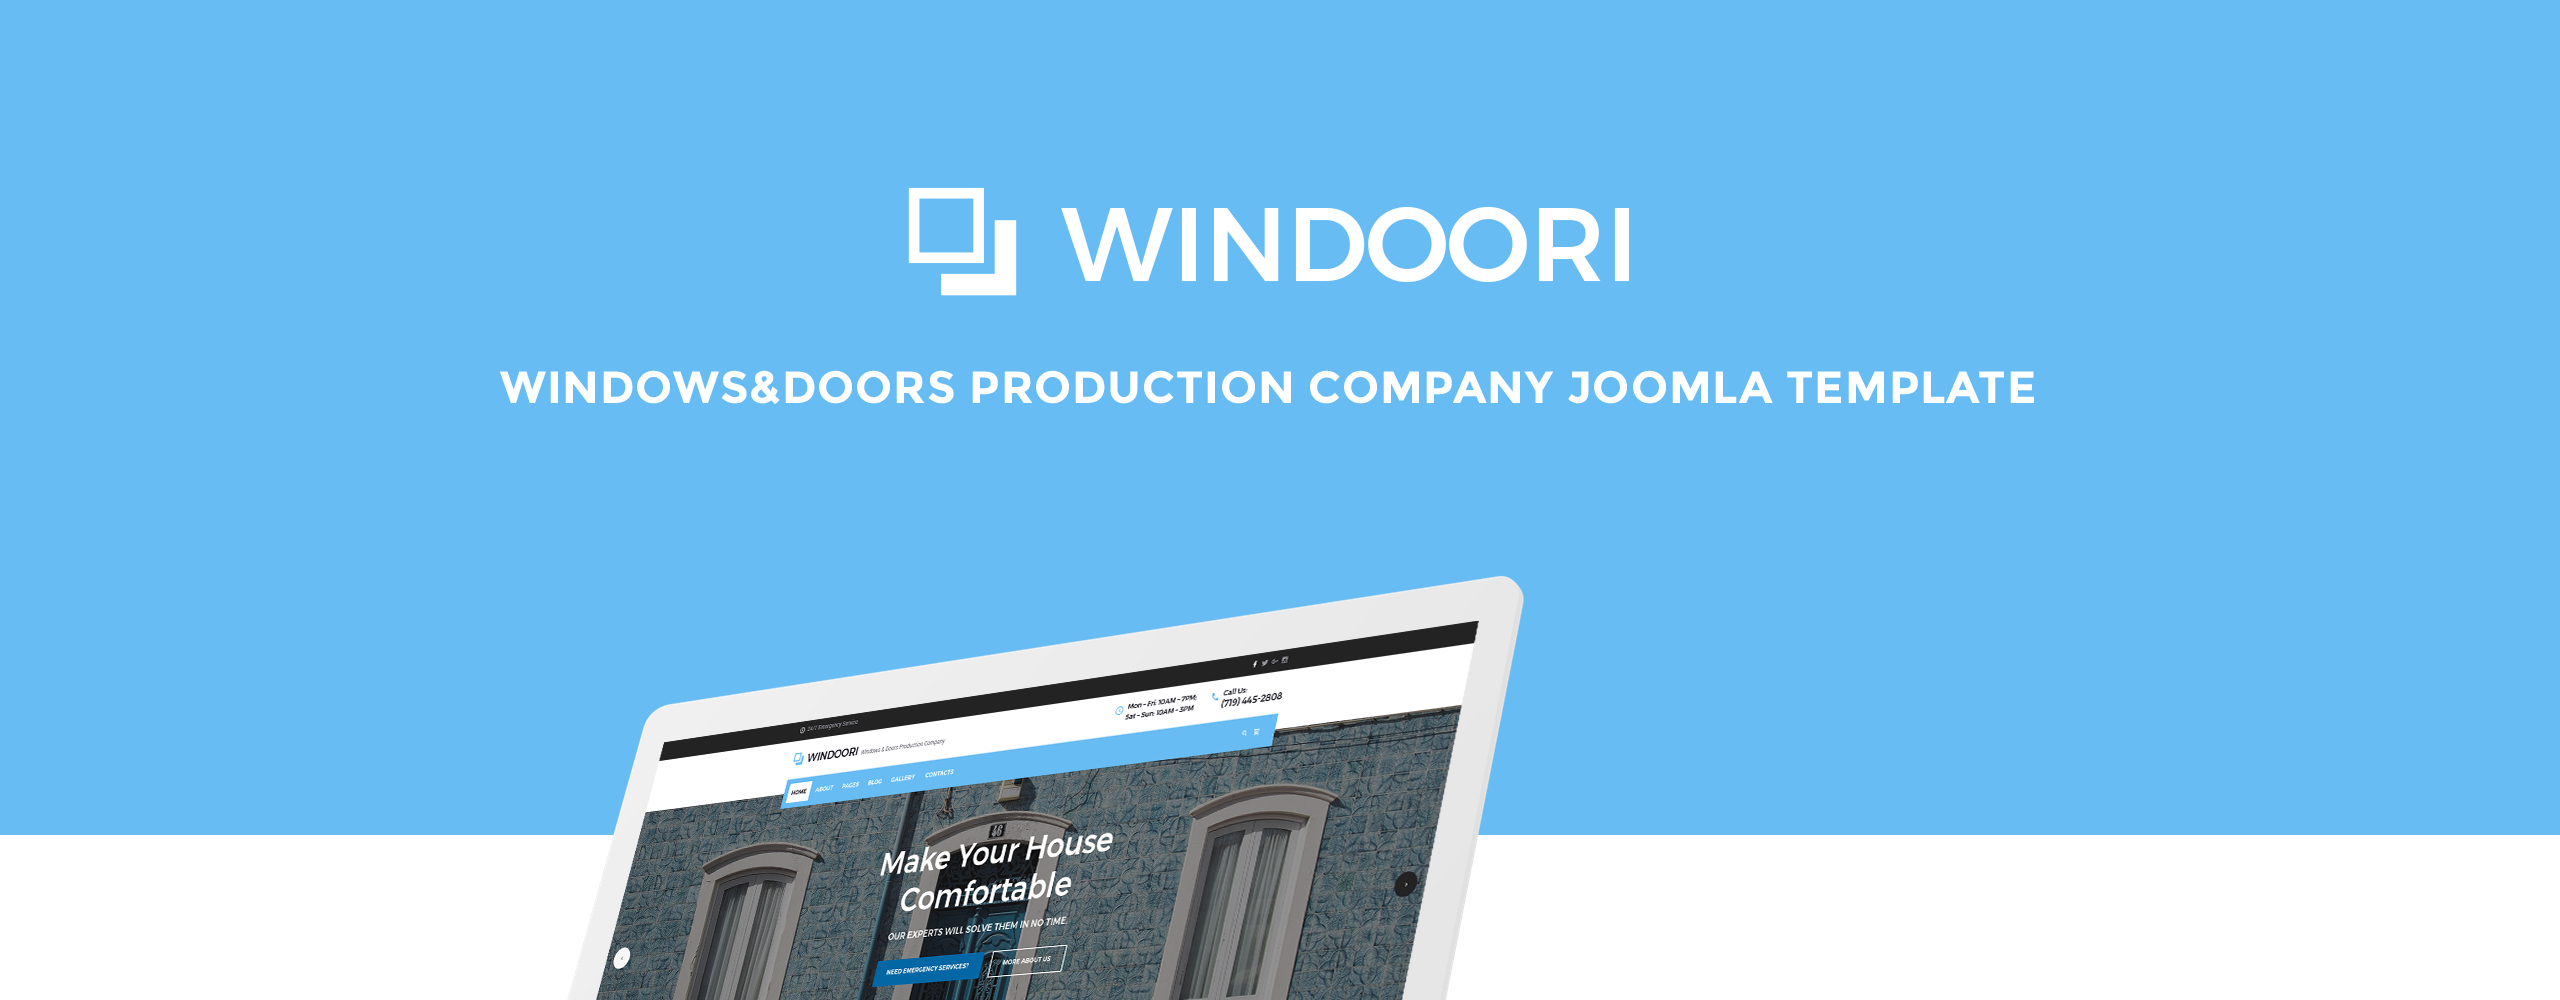 Website Design Template 70473 - windows doors interior design industrial repair renovation architecture